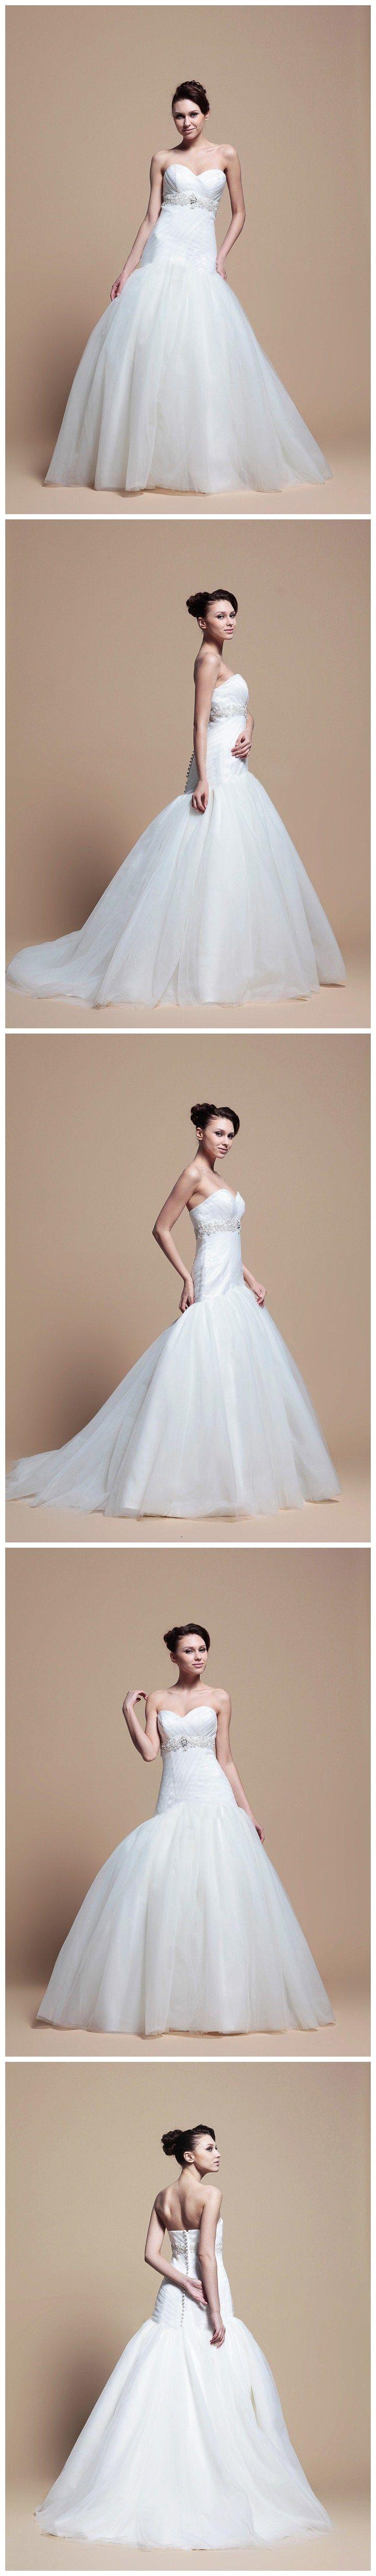 Sweetheart With Dropped Waist Fashion Wedding Dress